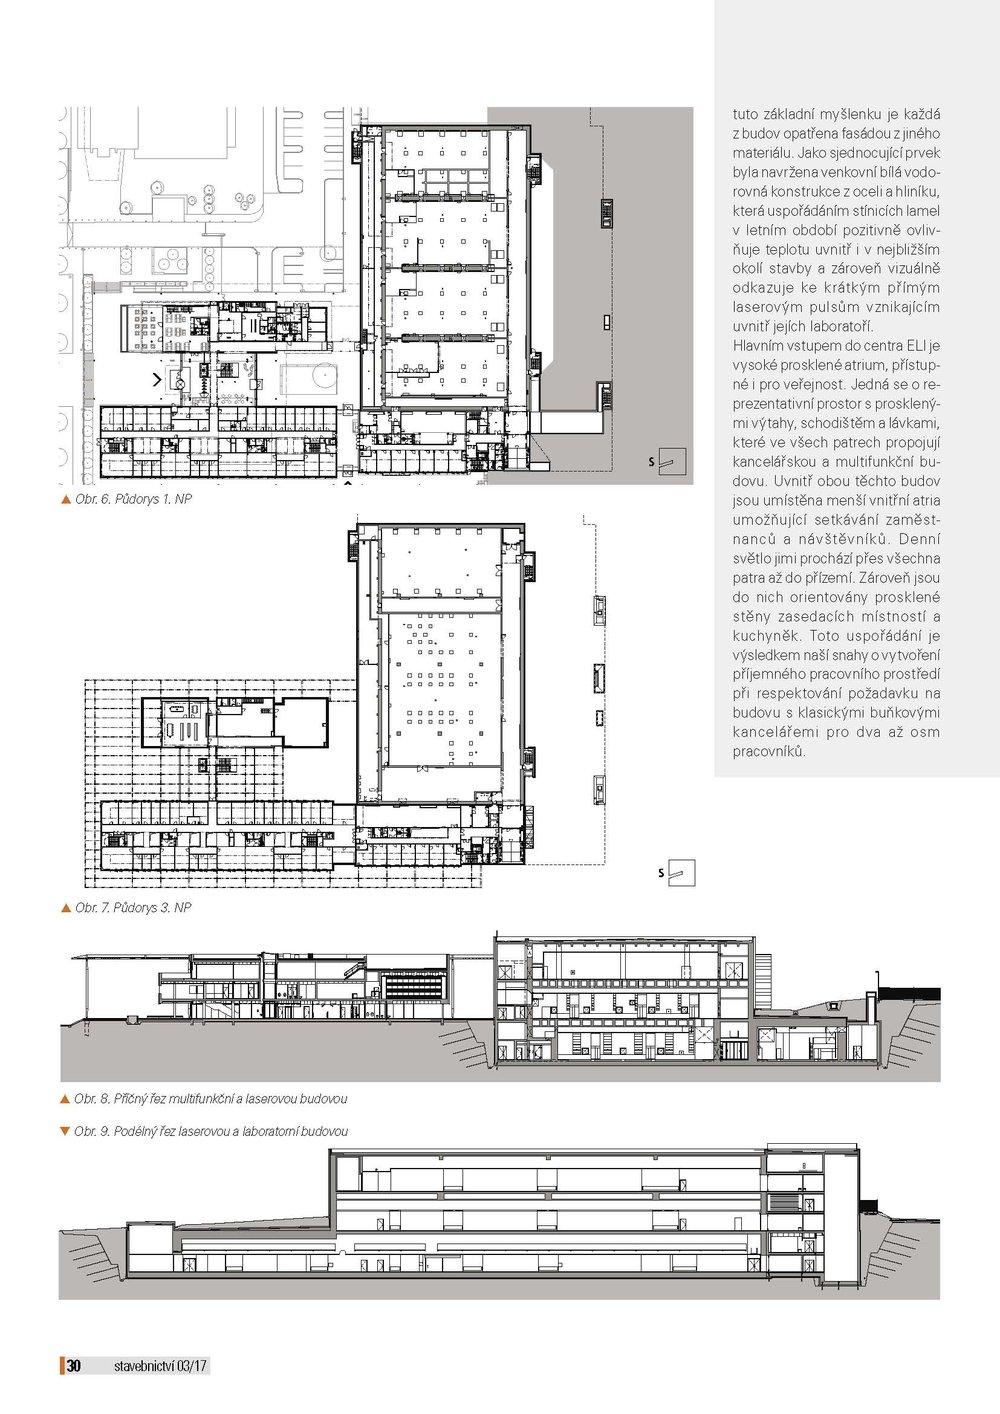 casopis stavebnictvi 03-17 ELI_PUBLISHED_Page_3.jpg